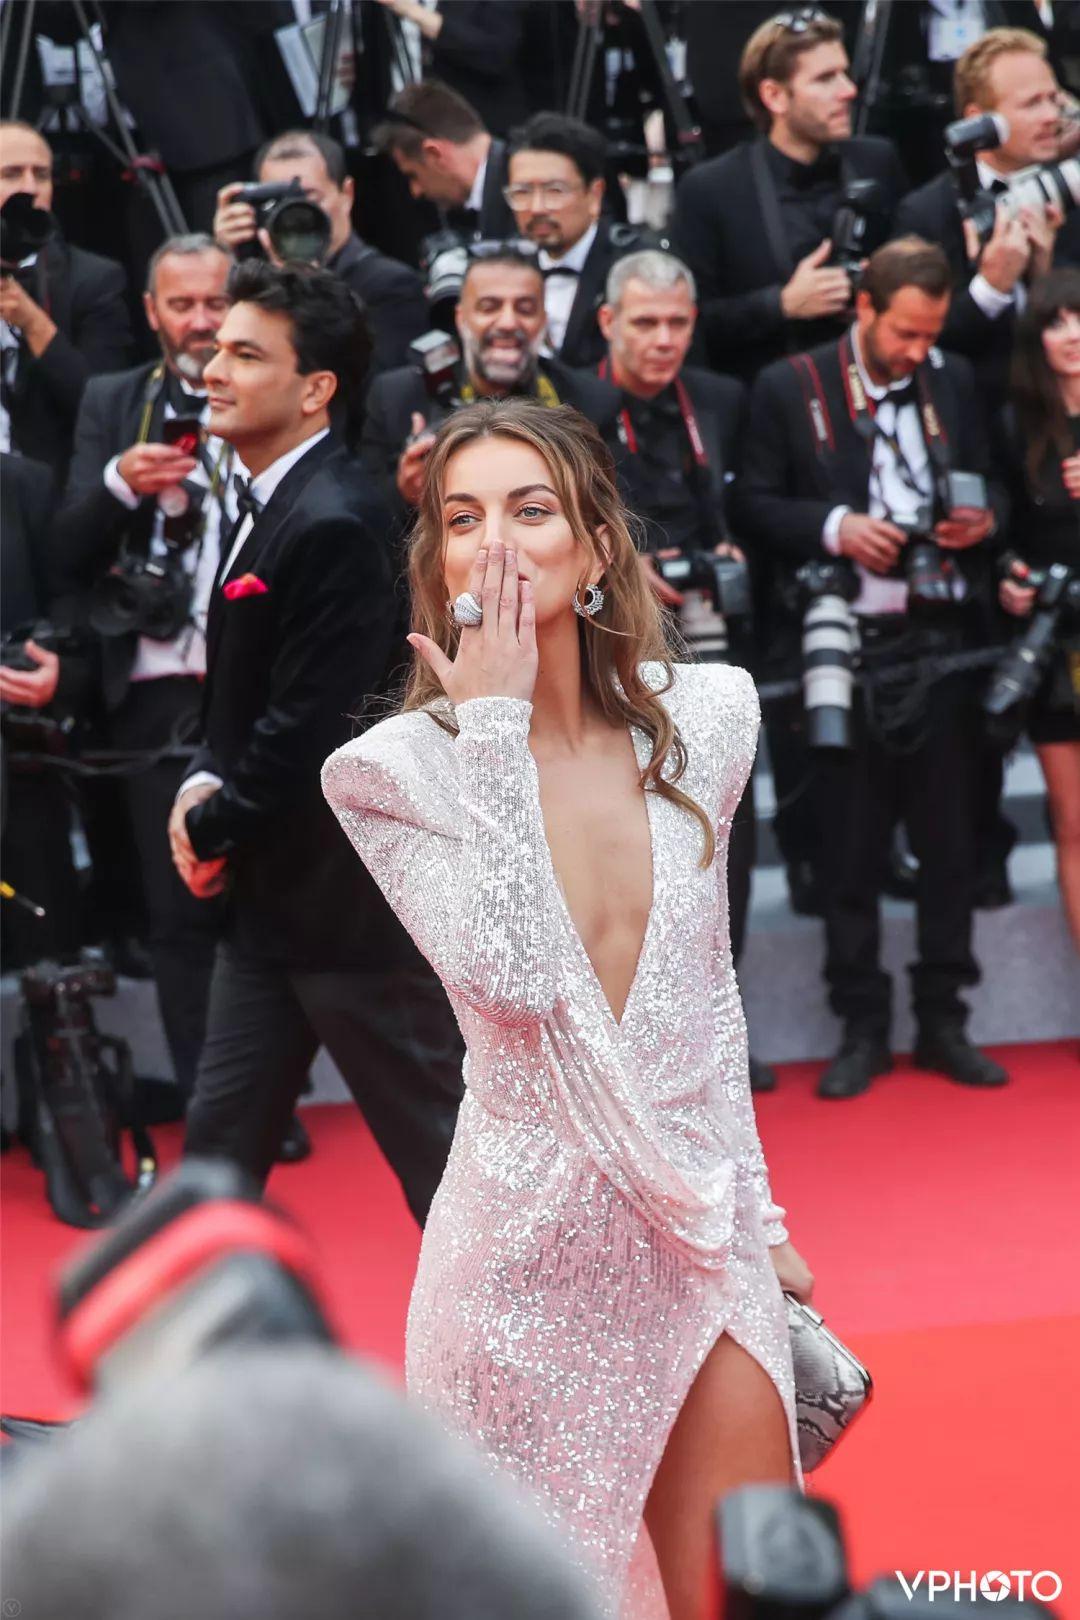 vphoto直击戛纳|在2019戛纳电影节下载红毯上,最受摄影师们开幕的人3D左右分屏高清电影迅雷关注图片